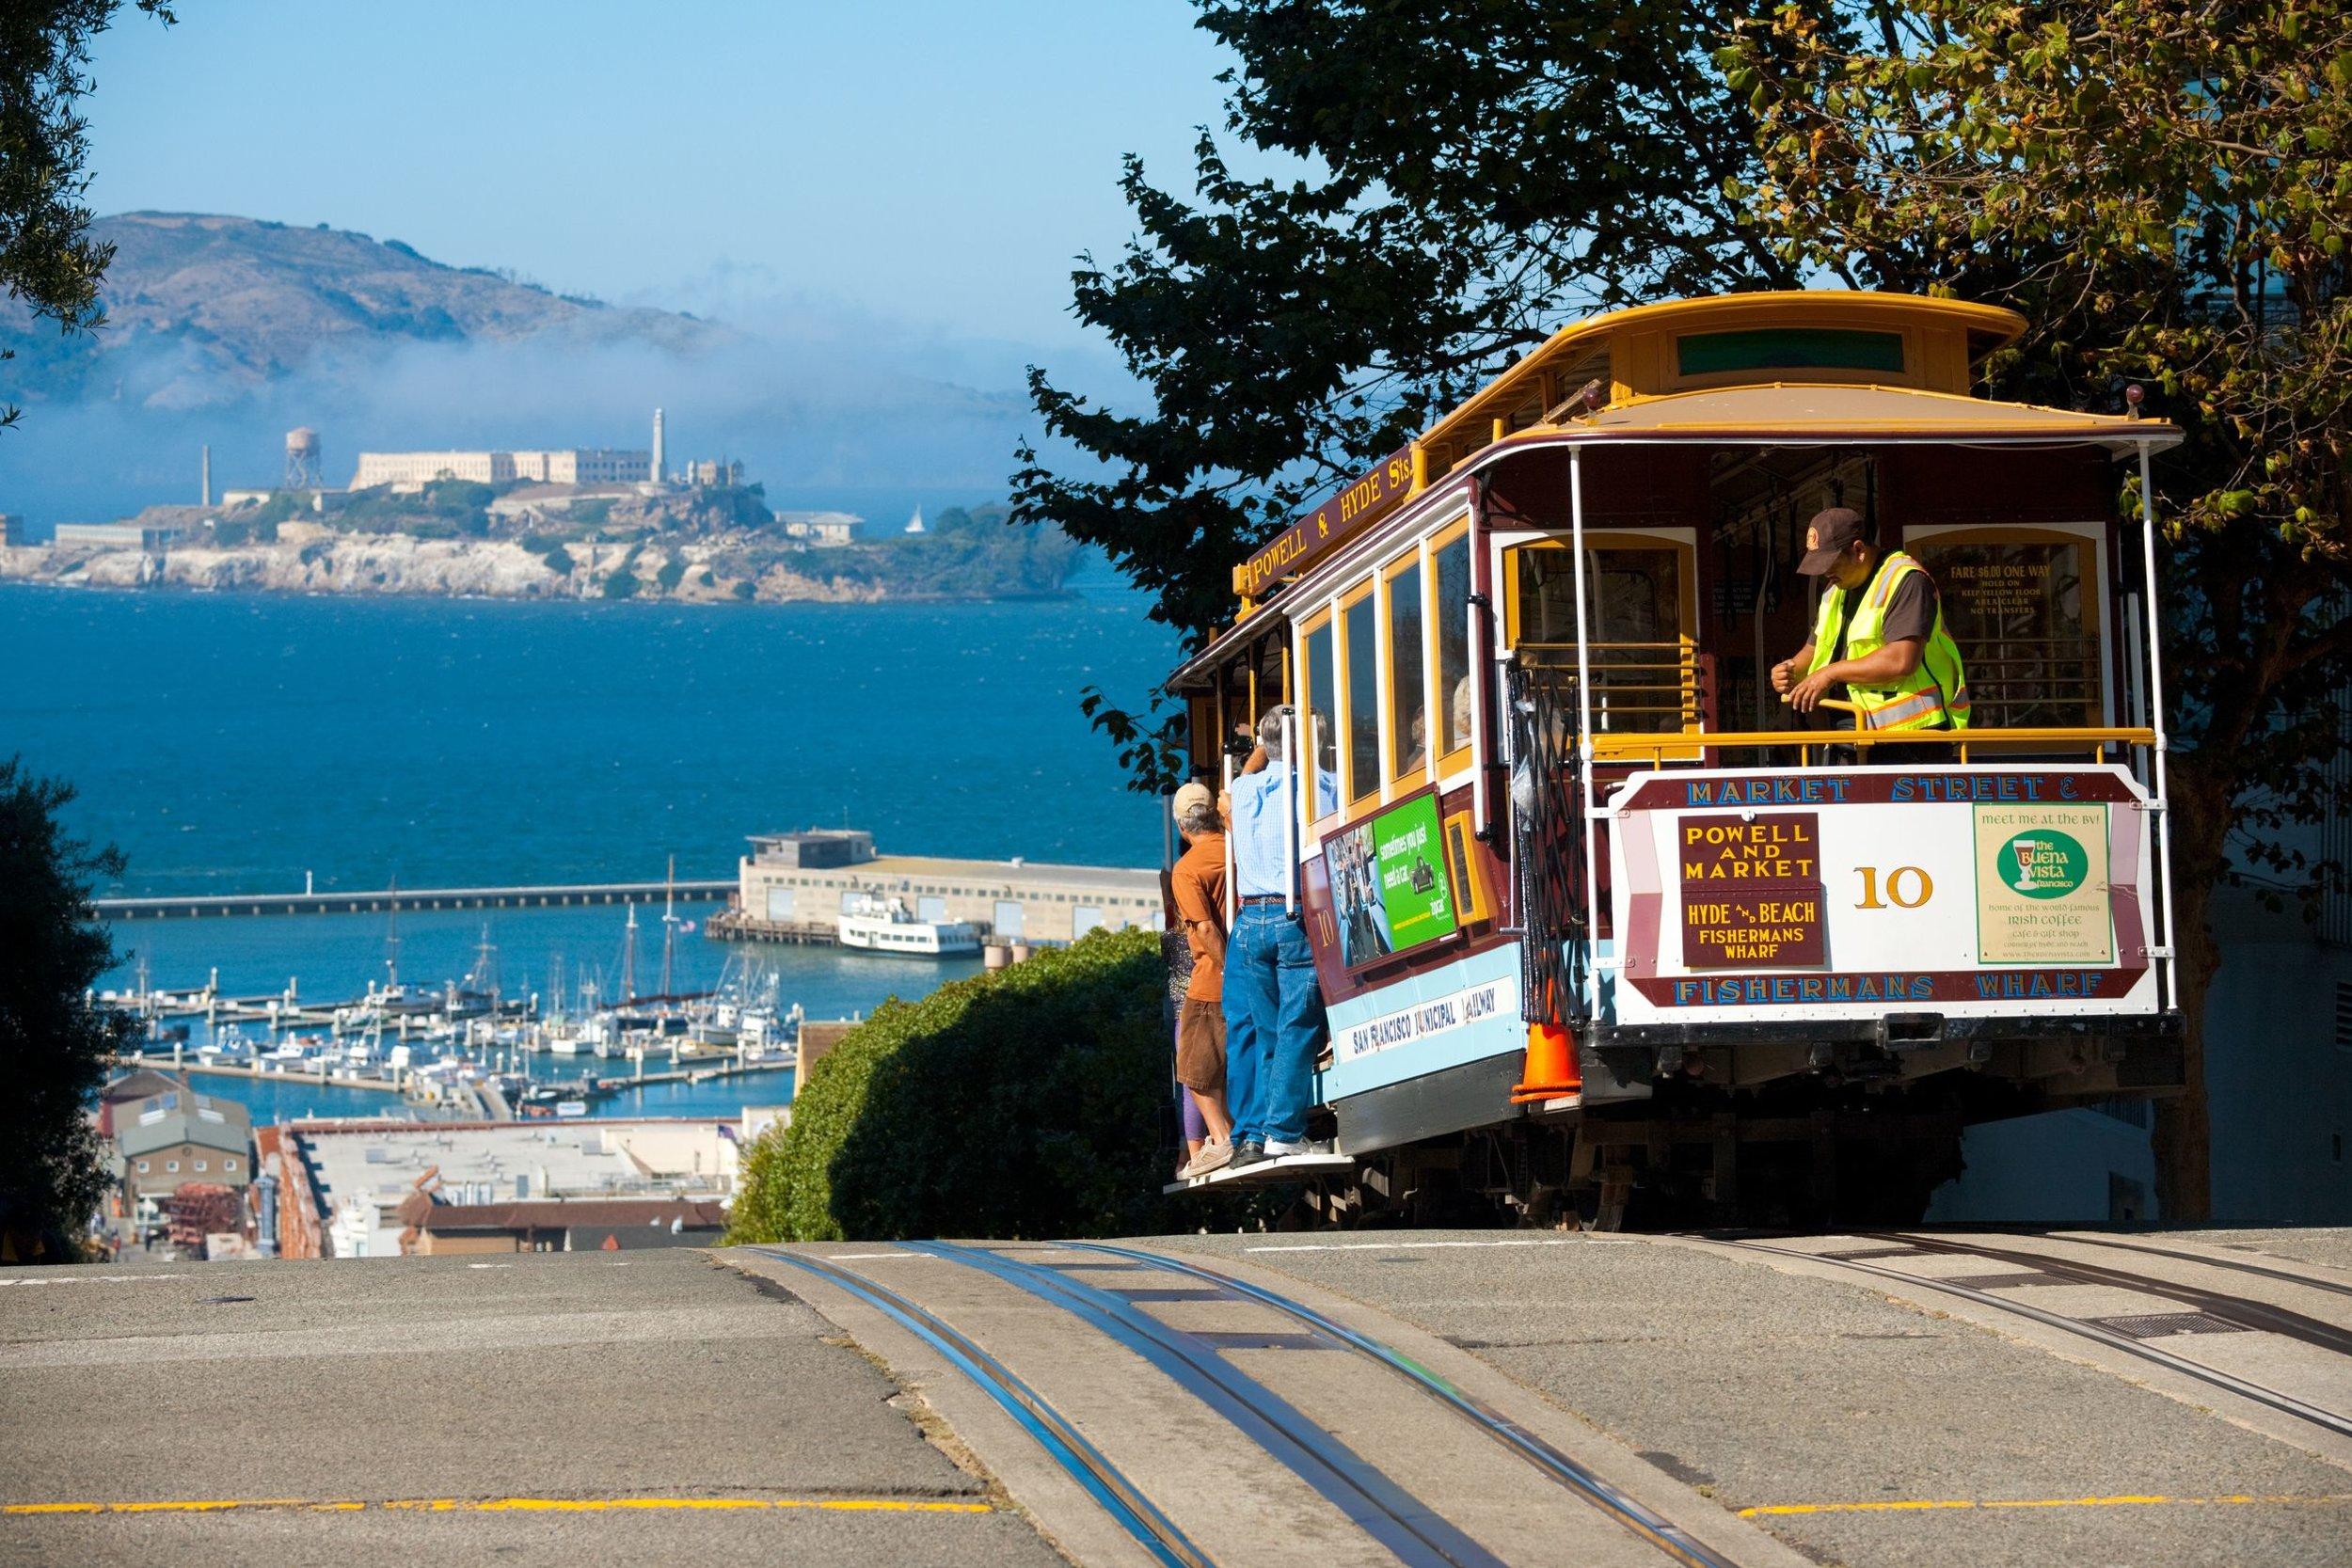 Tram en San Francisco